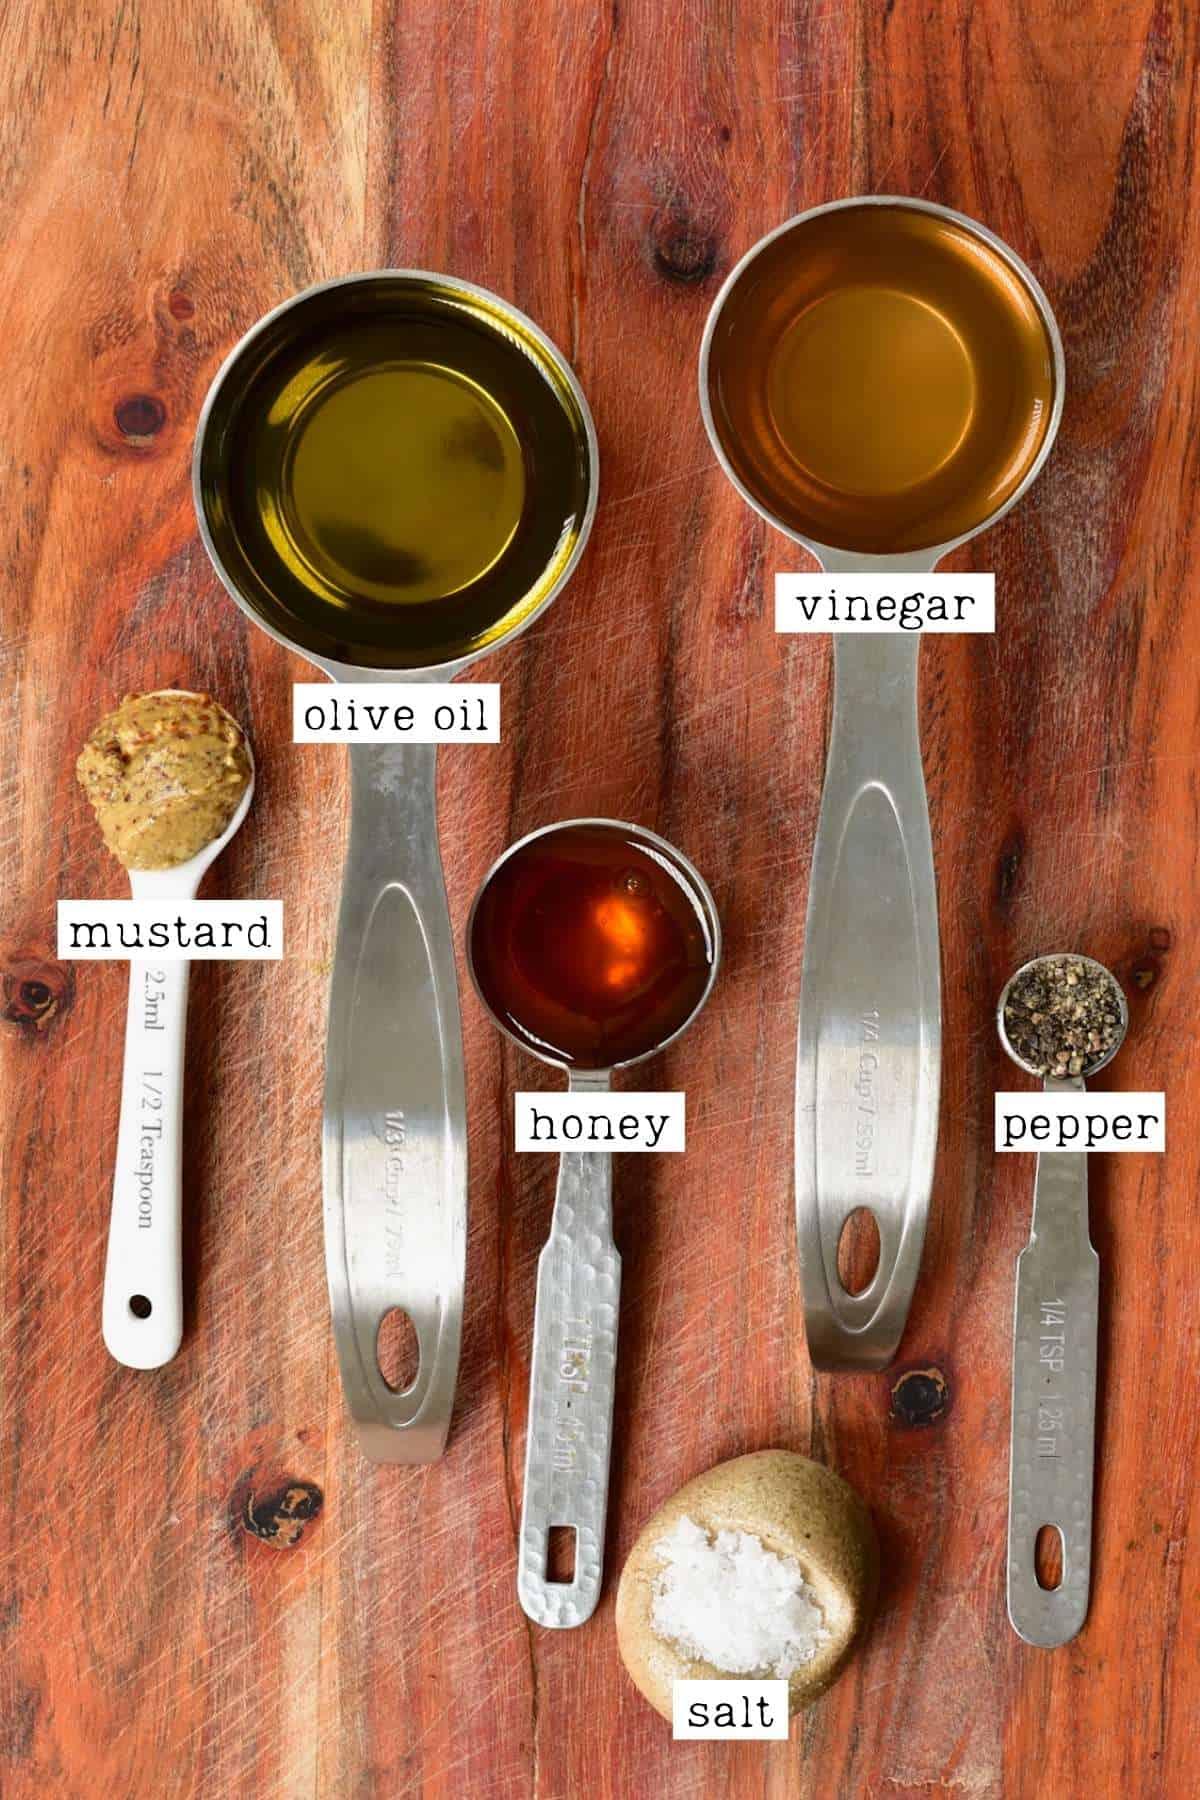 Ingredients for honey mustard dressing